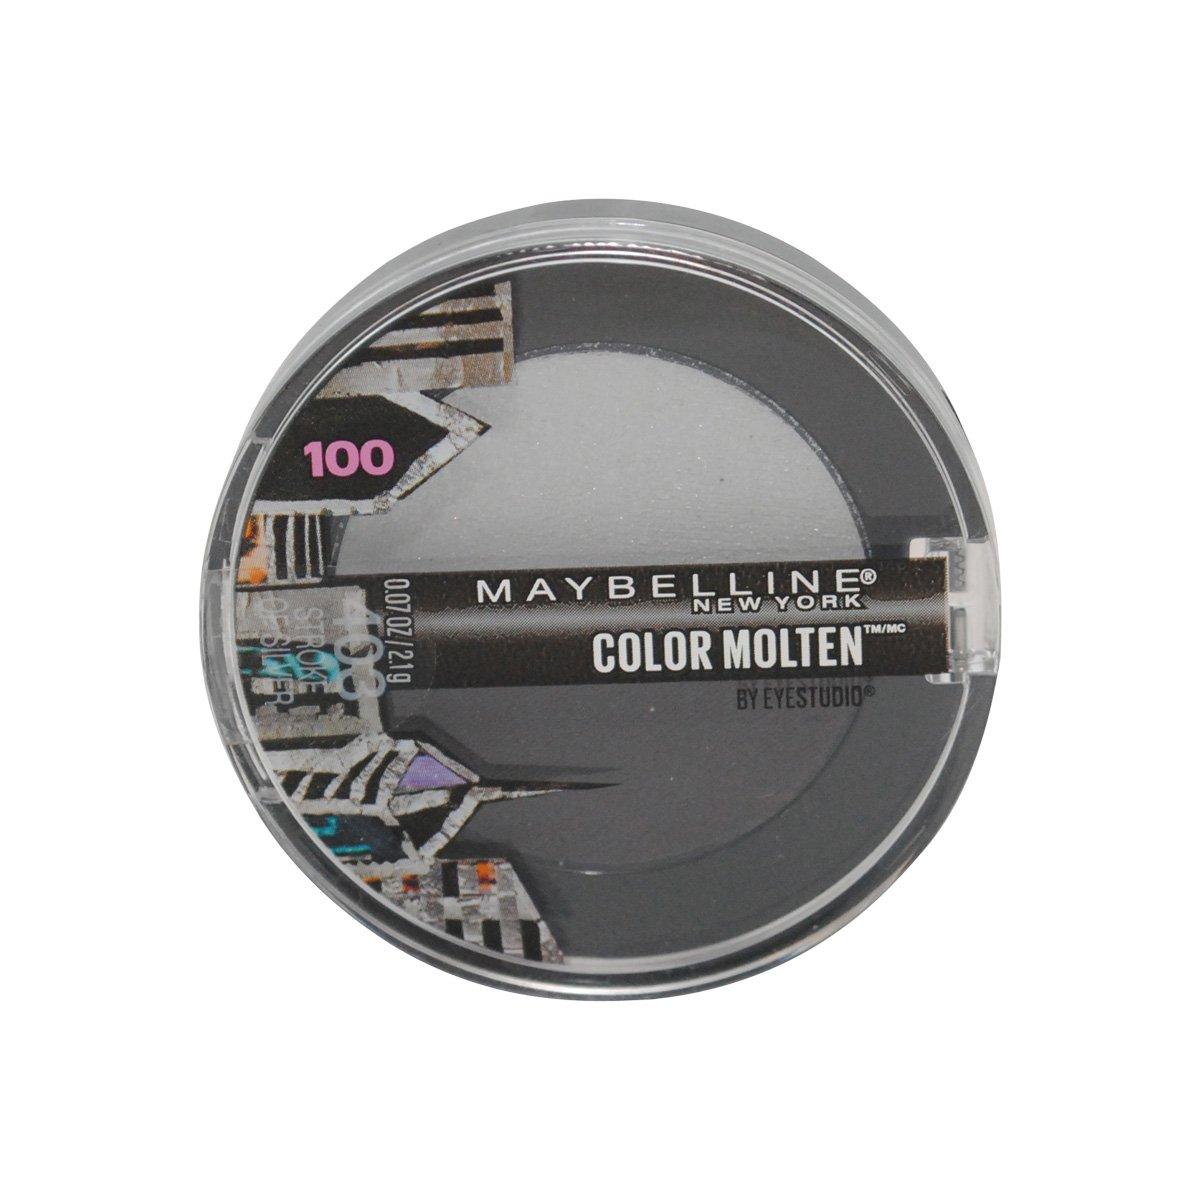 Maybelline New York Eye Studio Limited Edition Color Molten Cream Eye Shadow - 403 Stroke of Silver